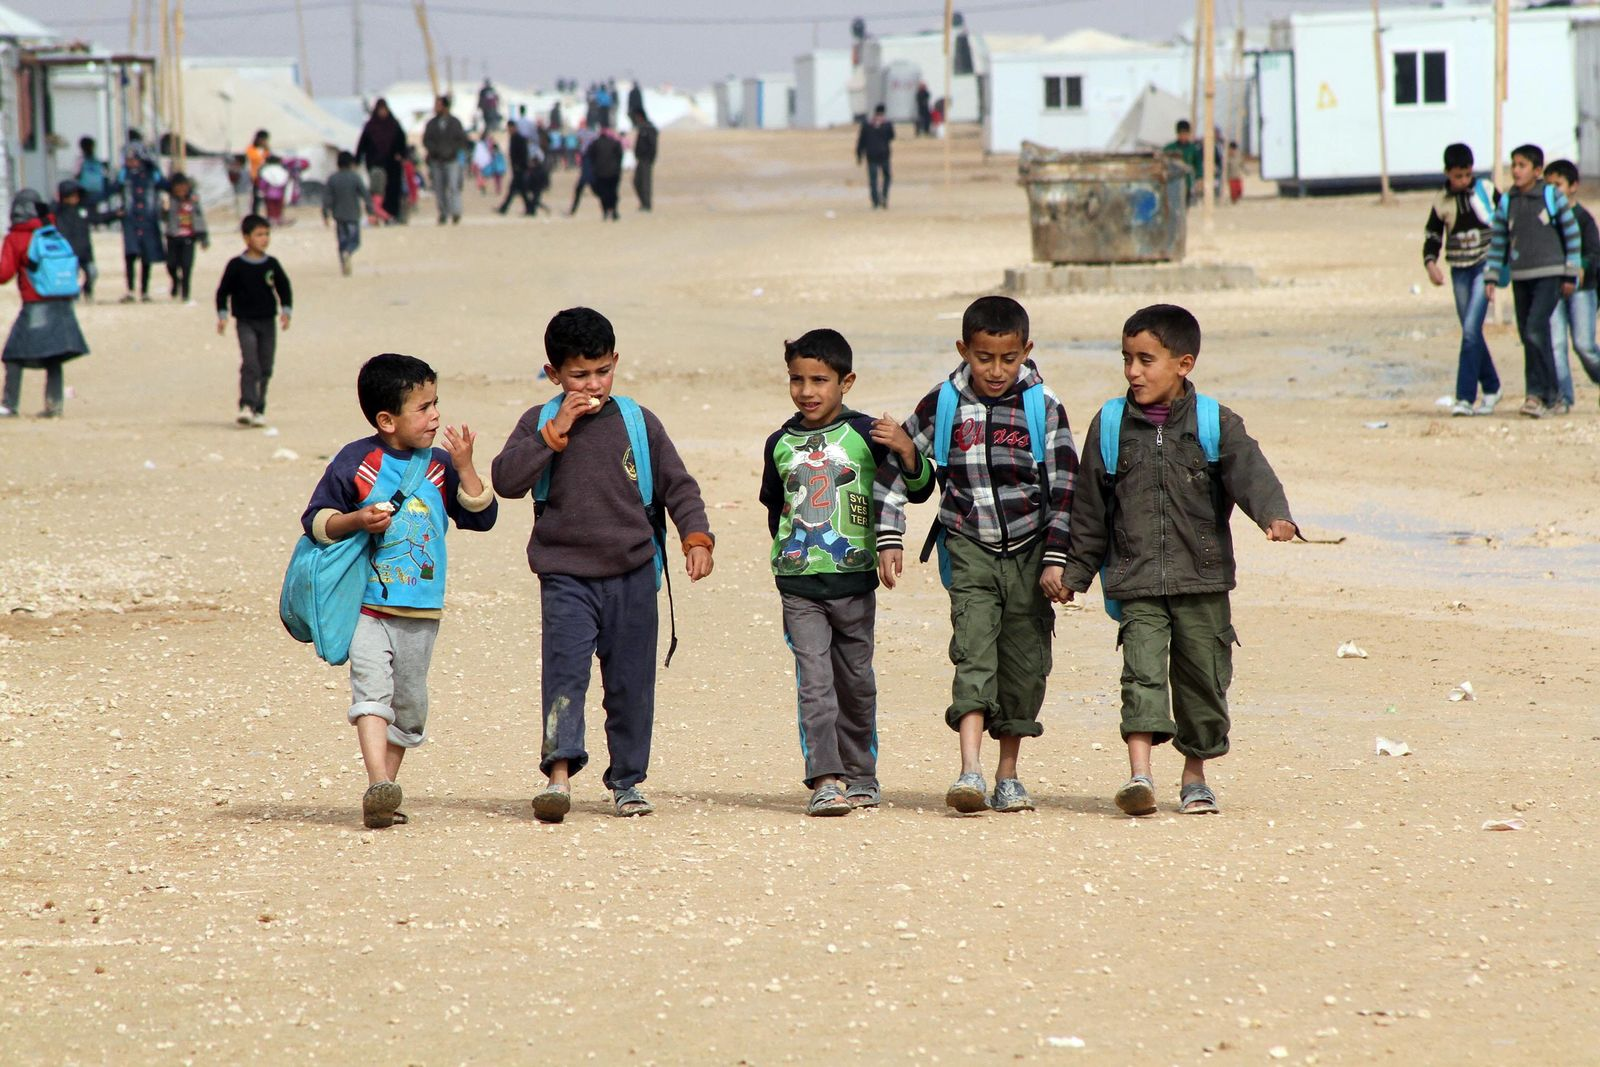 Syrische Flüchtlinge in Jordanien Flüchtlingskinder